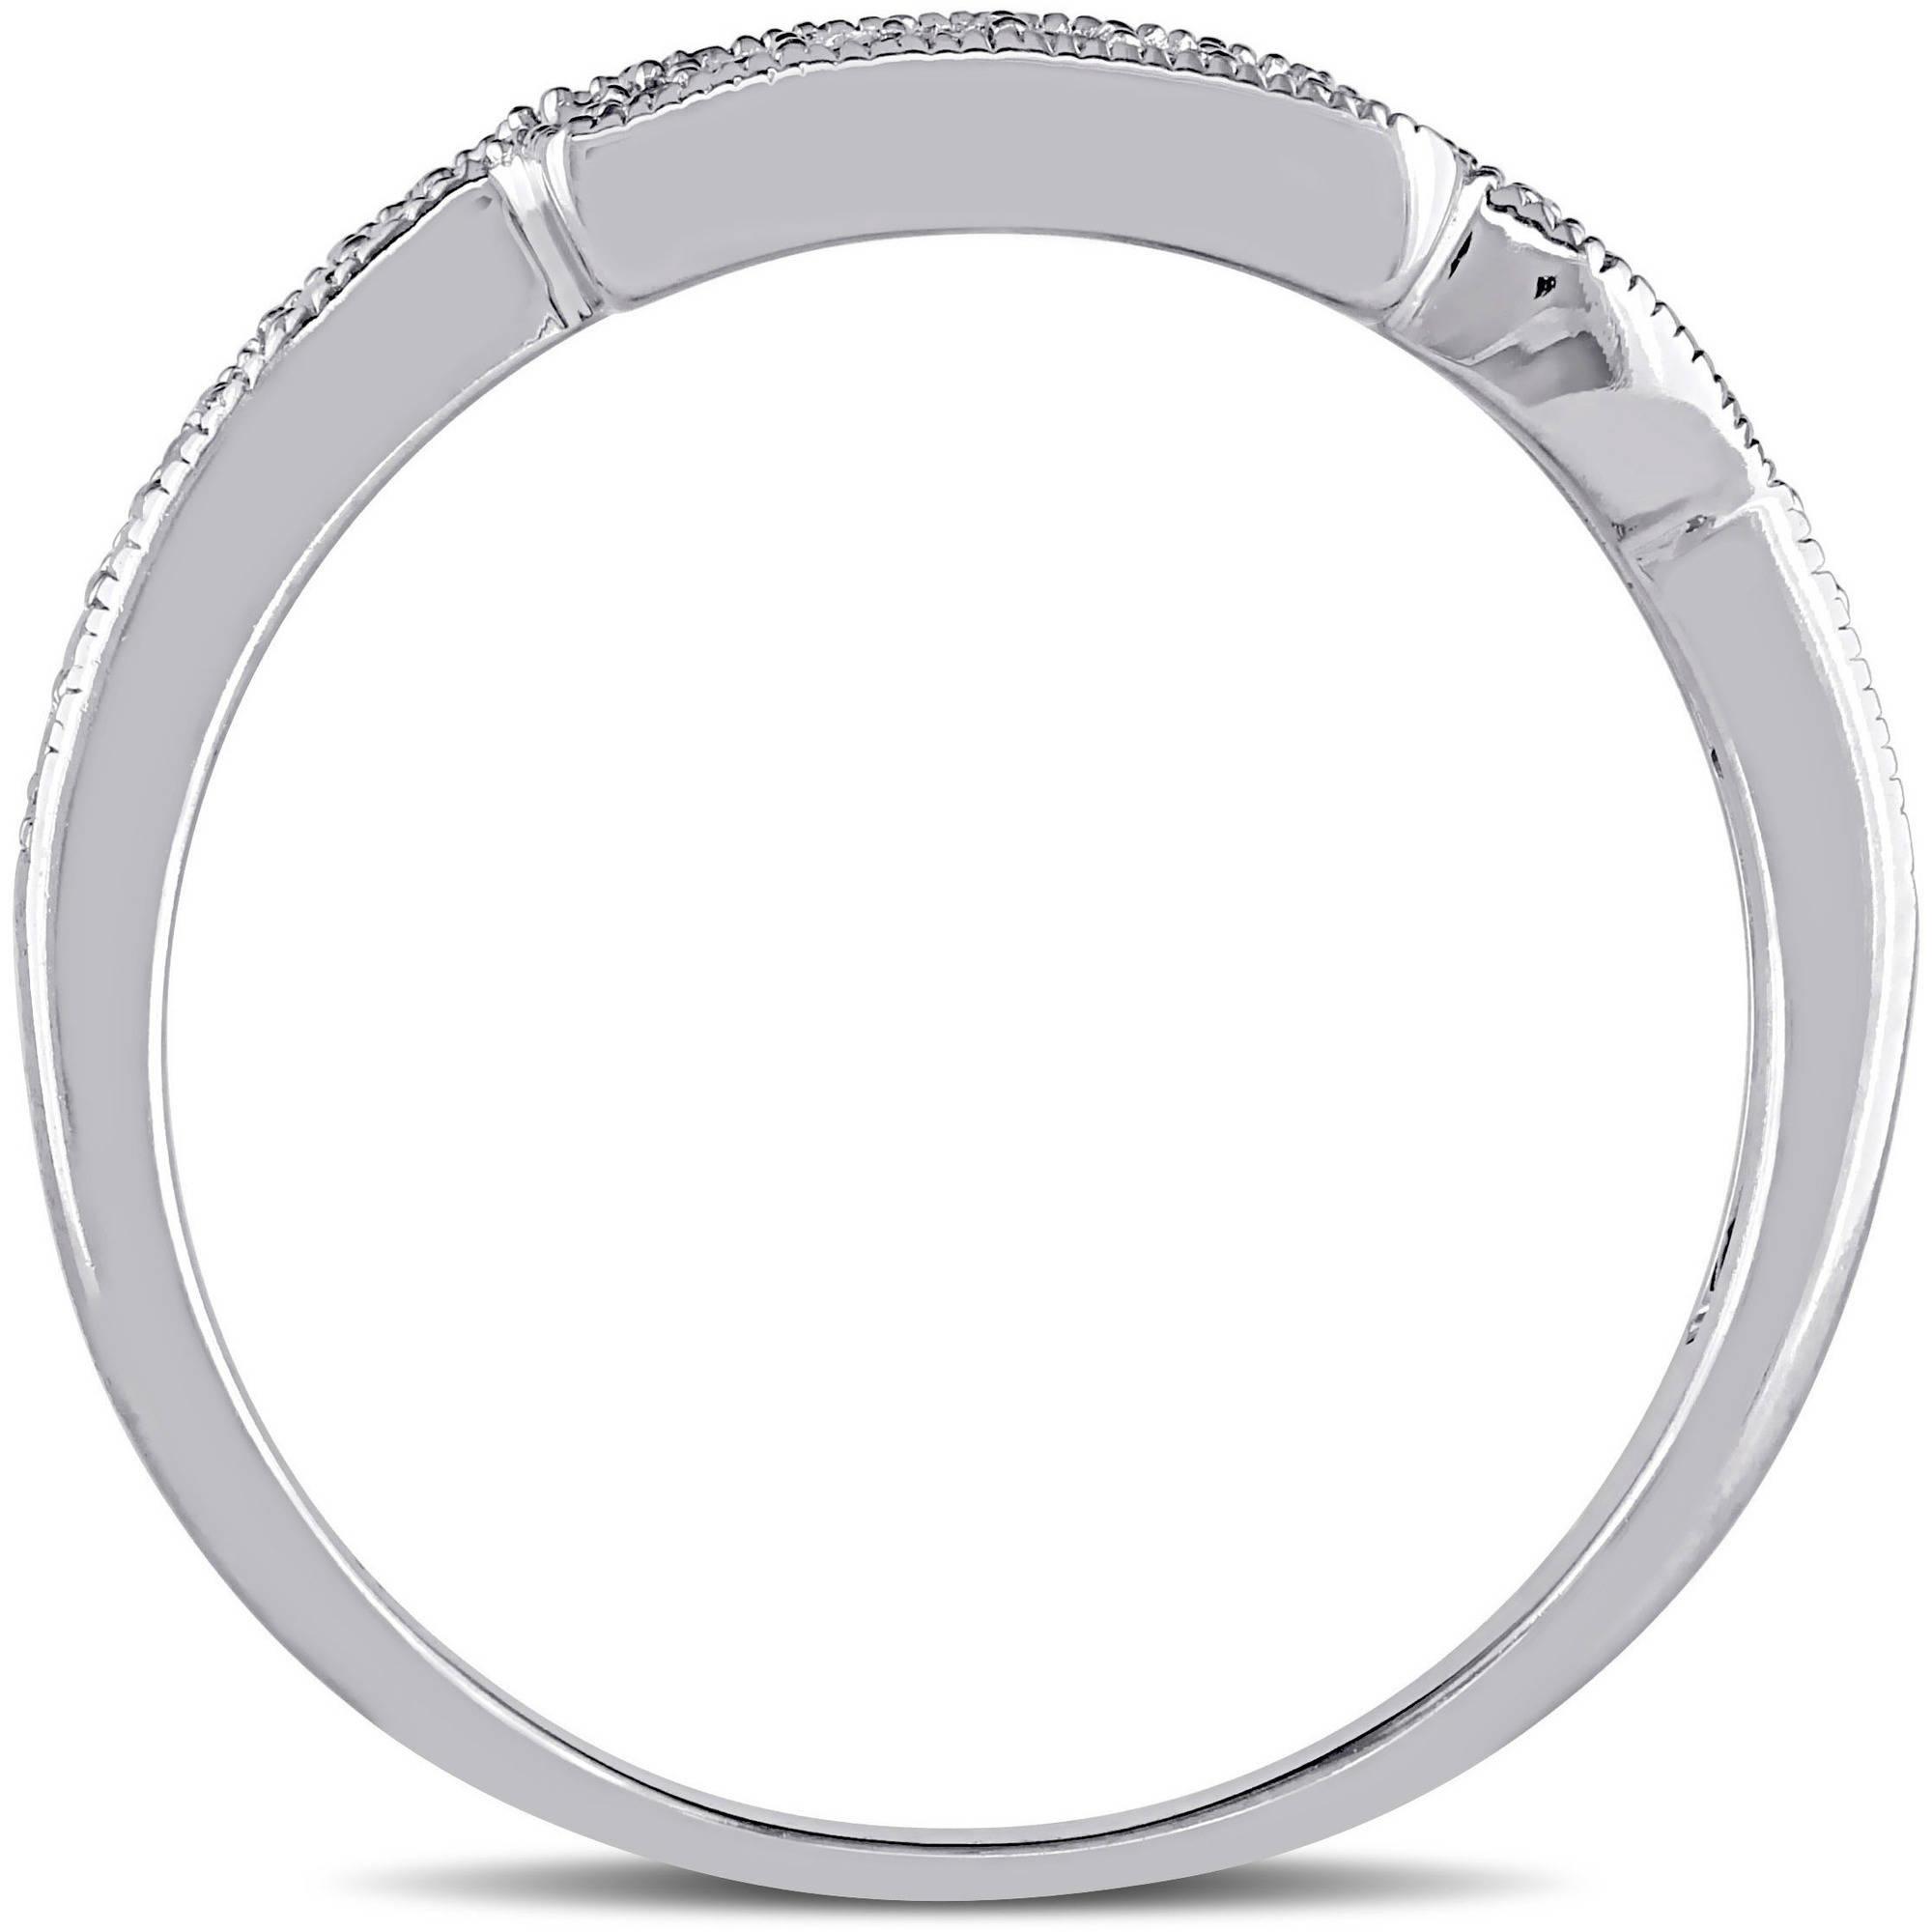 Miabella Diamond-Accent 10kt White Gold Wedding Band